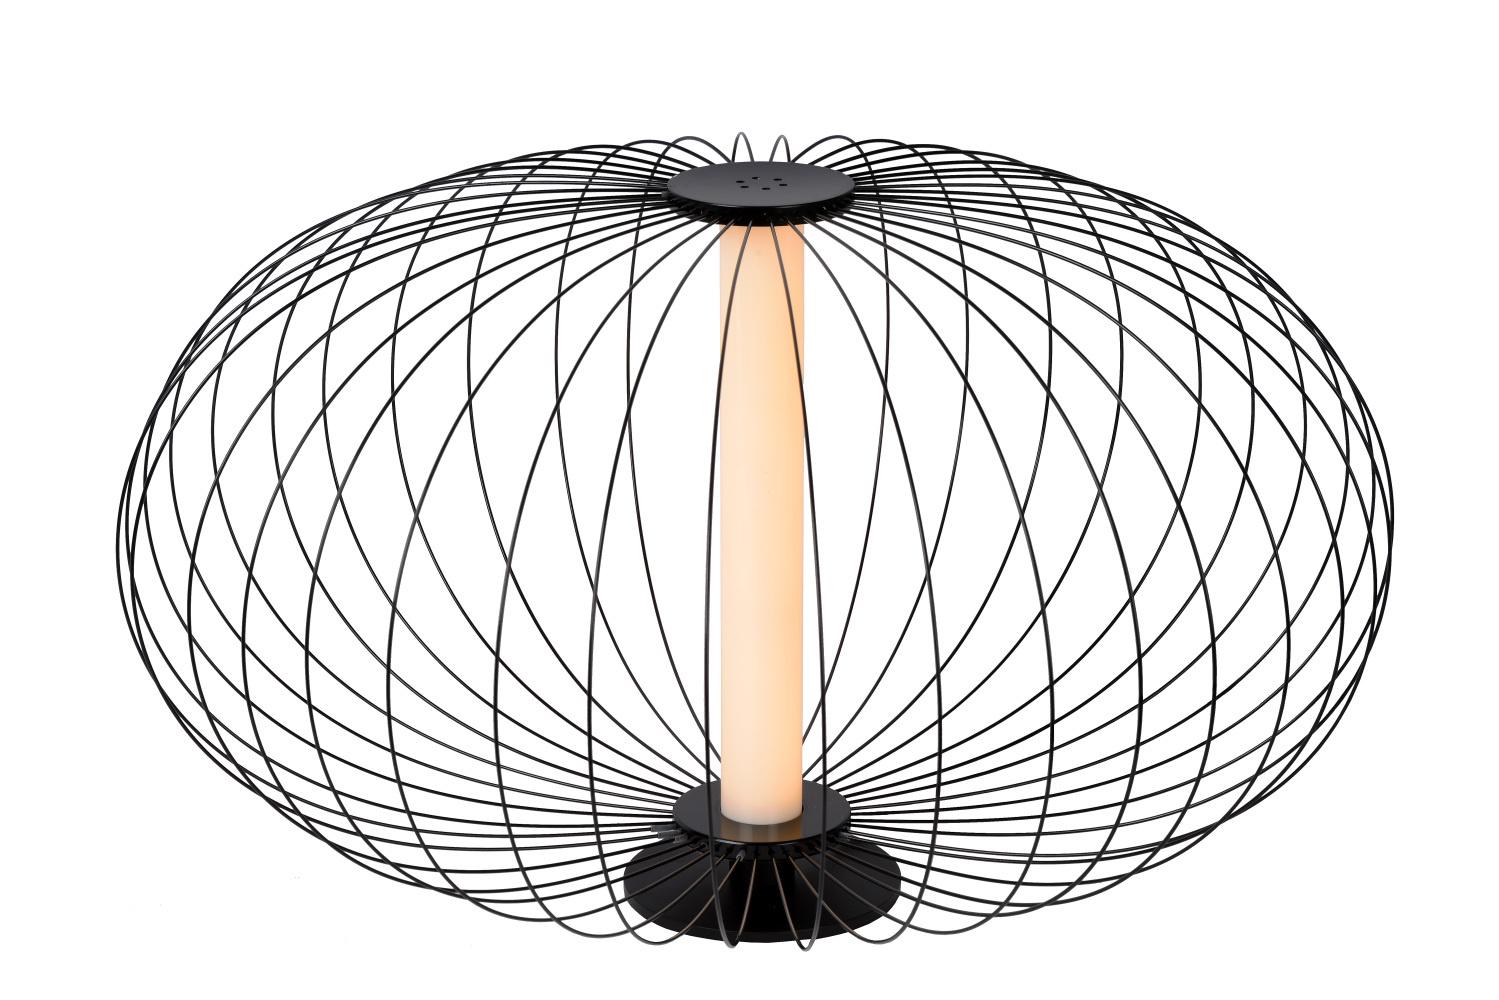 Lucide CARBONY Tafellamp LED 5W 2700K Zwart